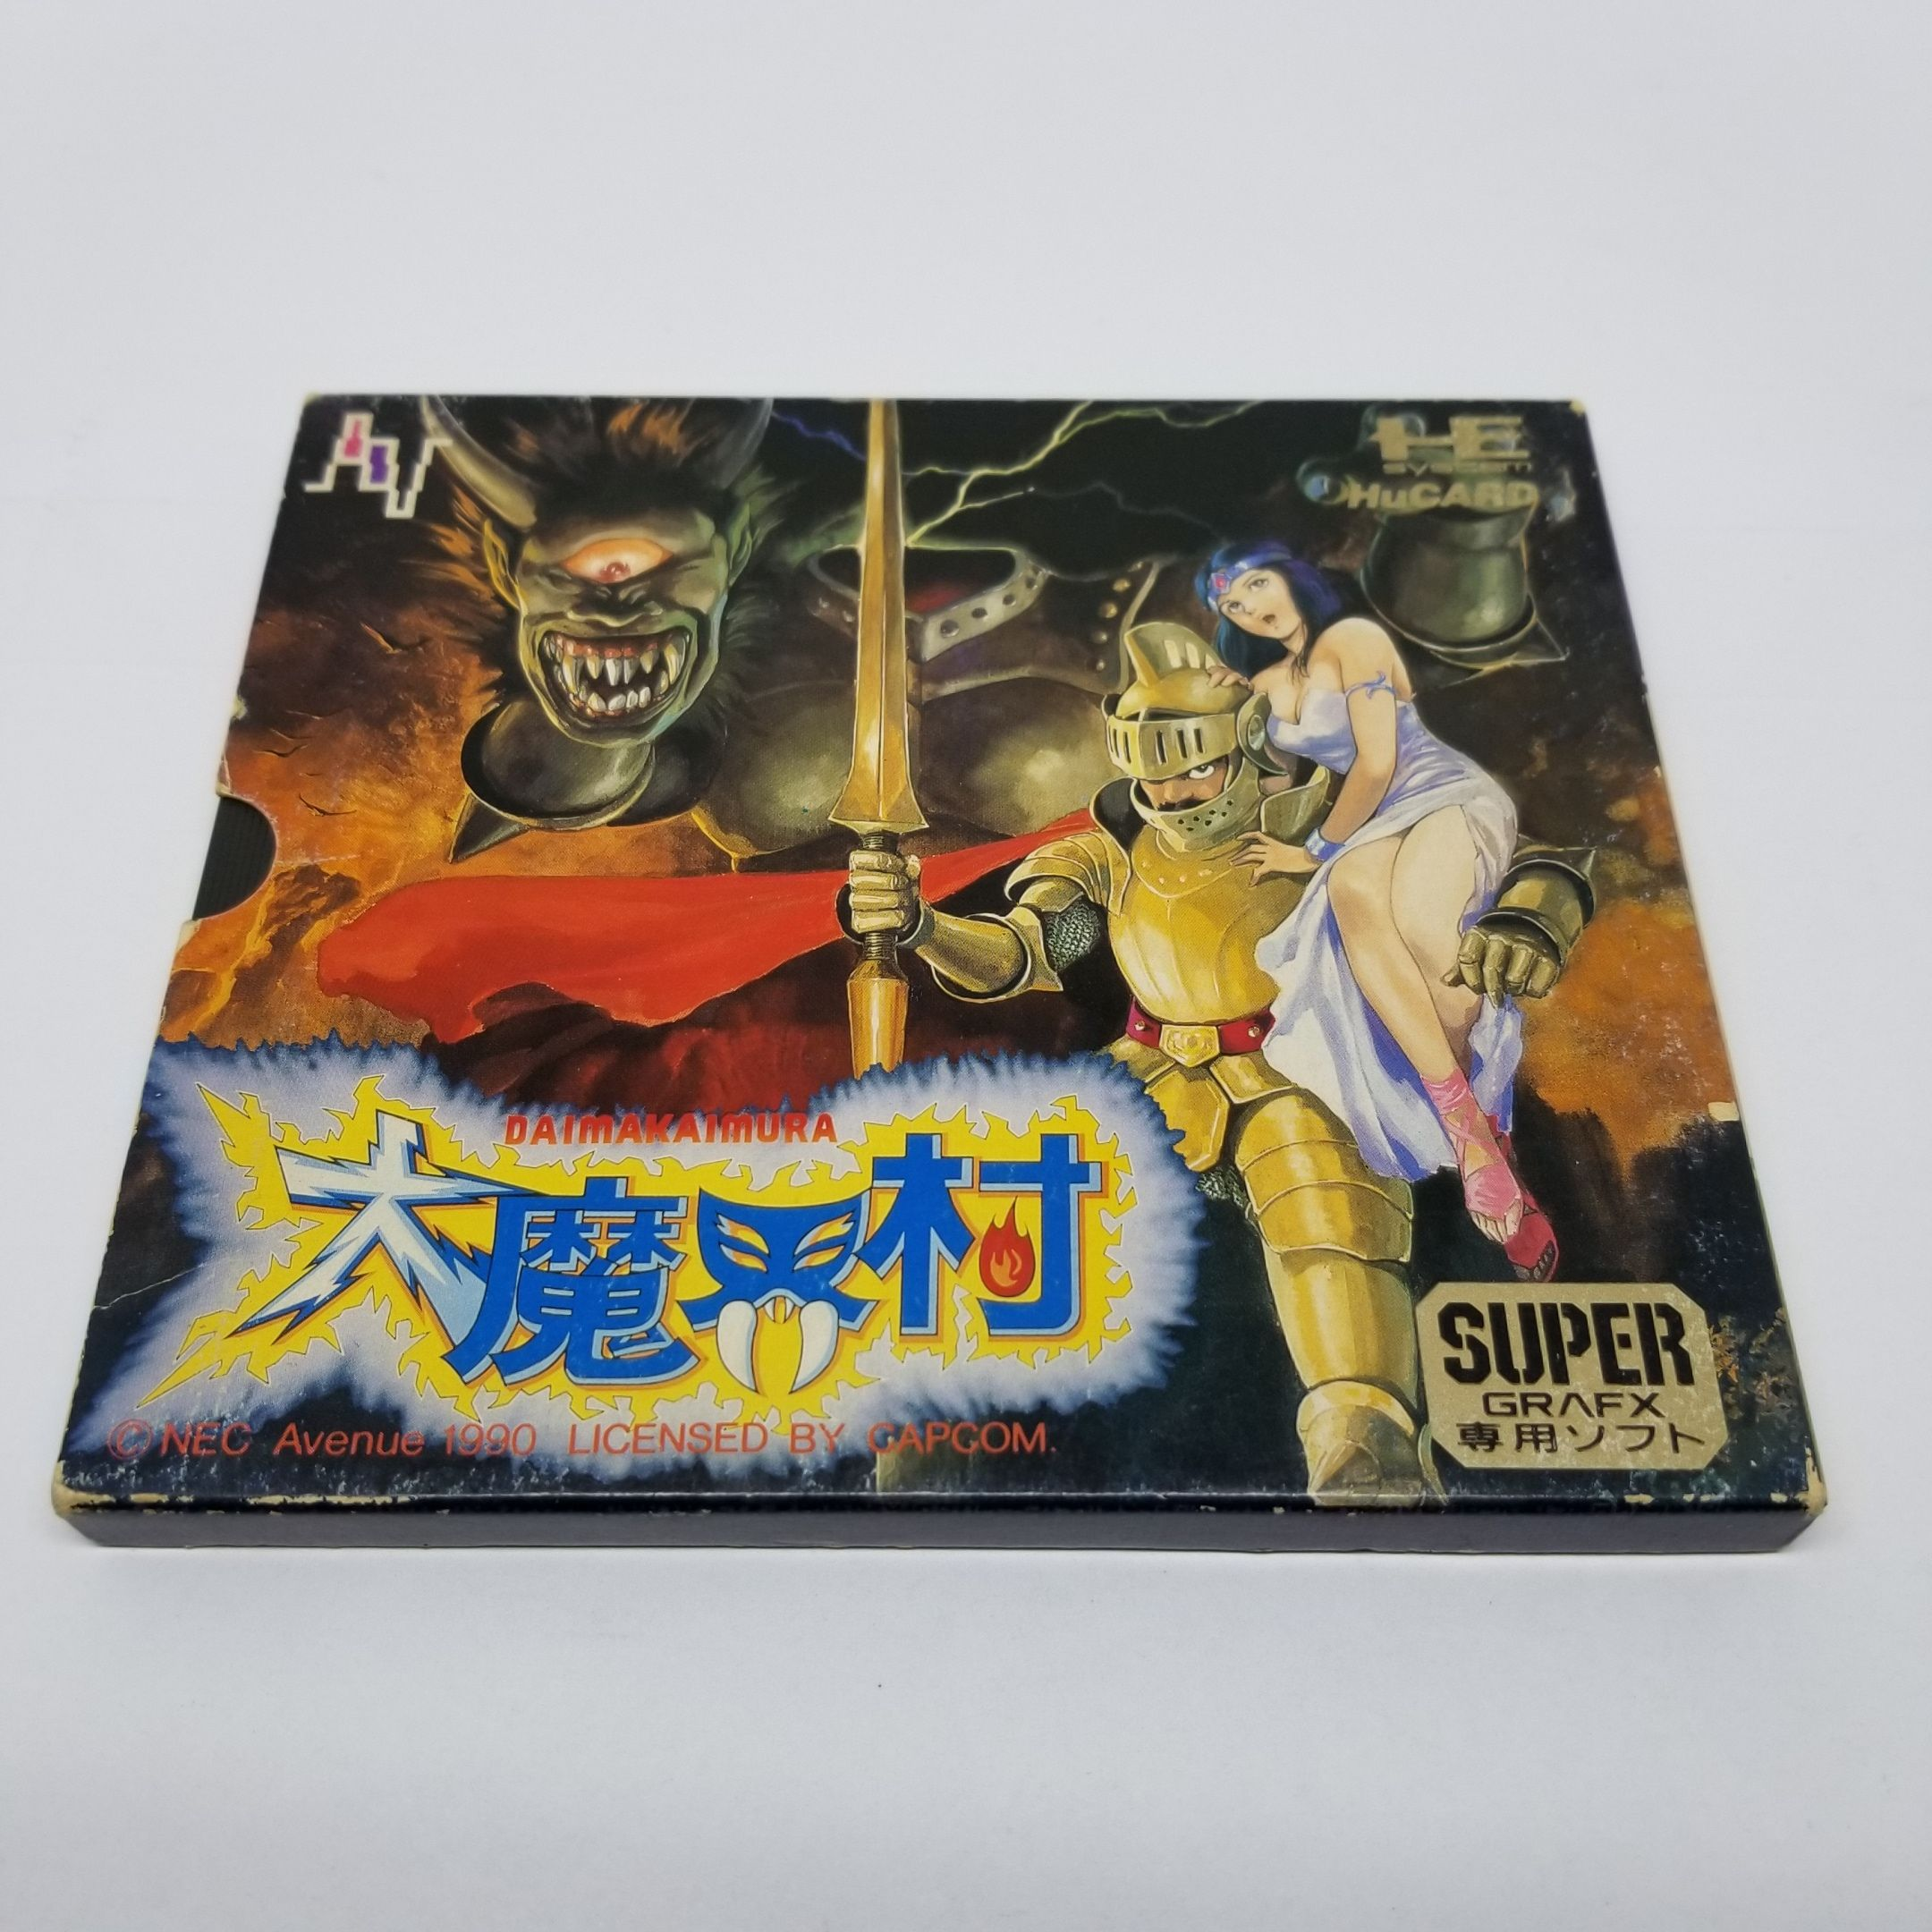 NEC PC Engine SuperGrafx HuCard DAIMAKAIMURA Ghouls n Ghosts